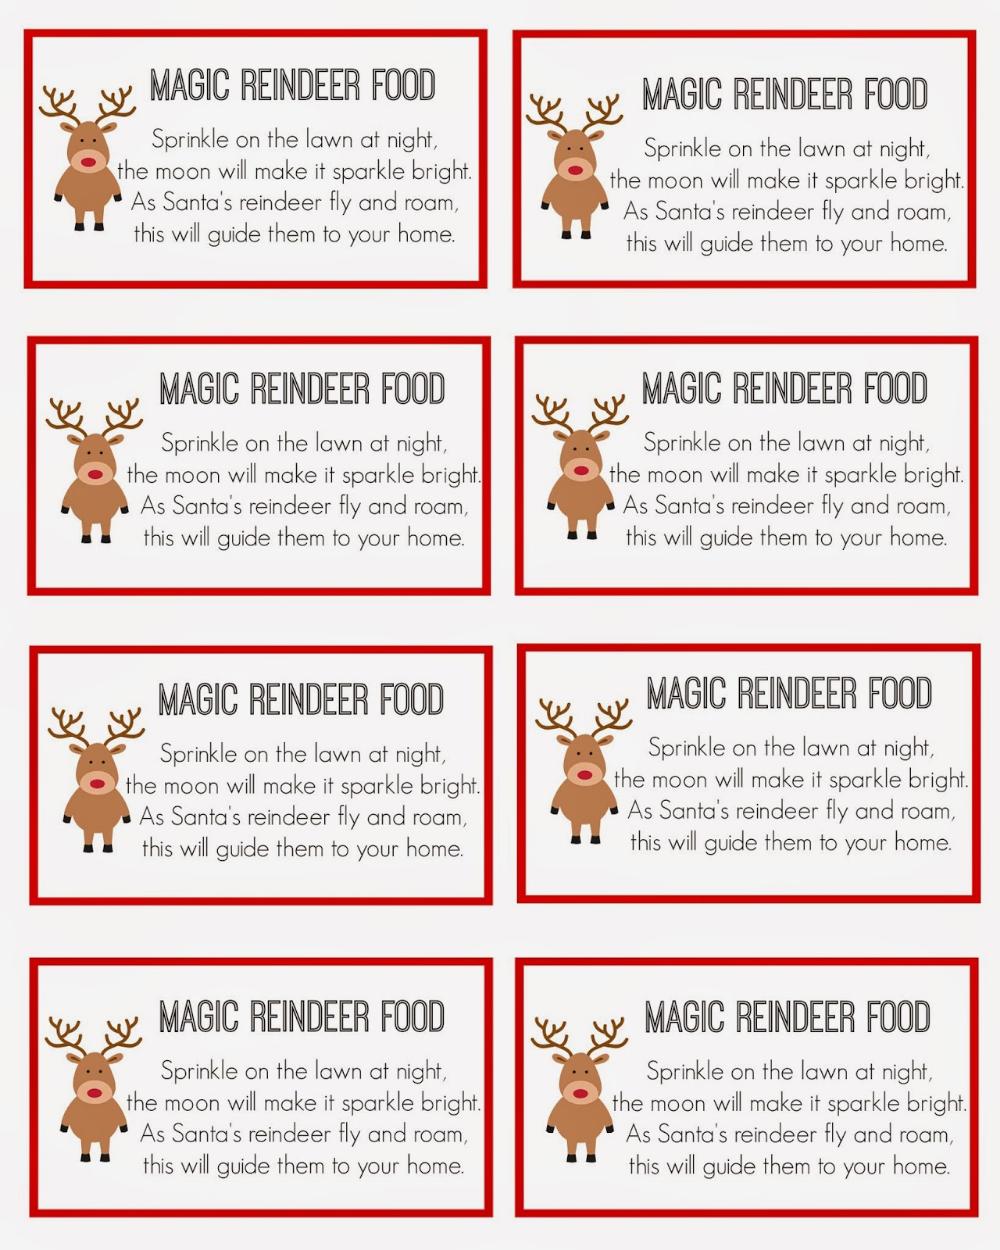 East Coast Mommy Magic Reindeer Food Magic Reindeer Food